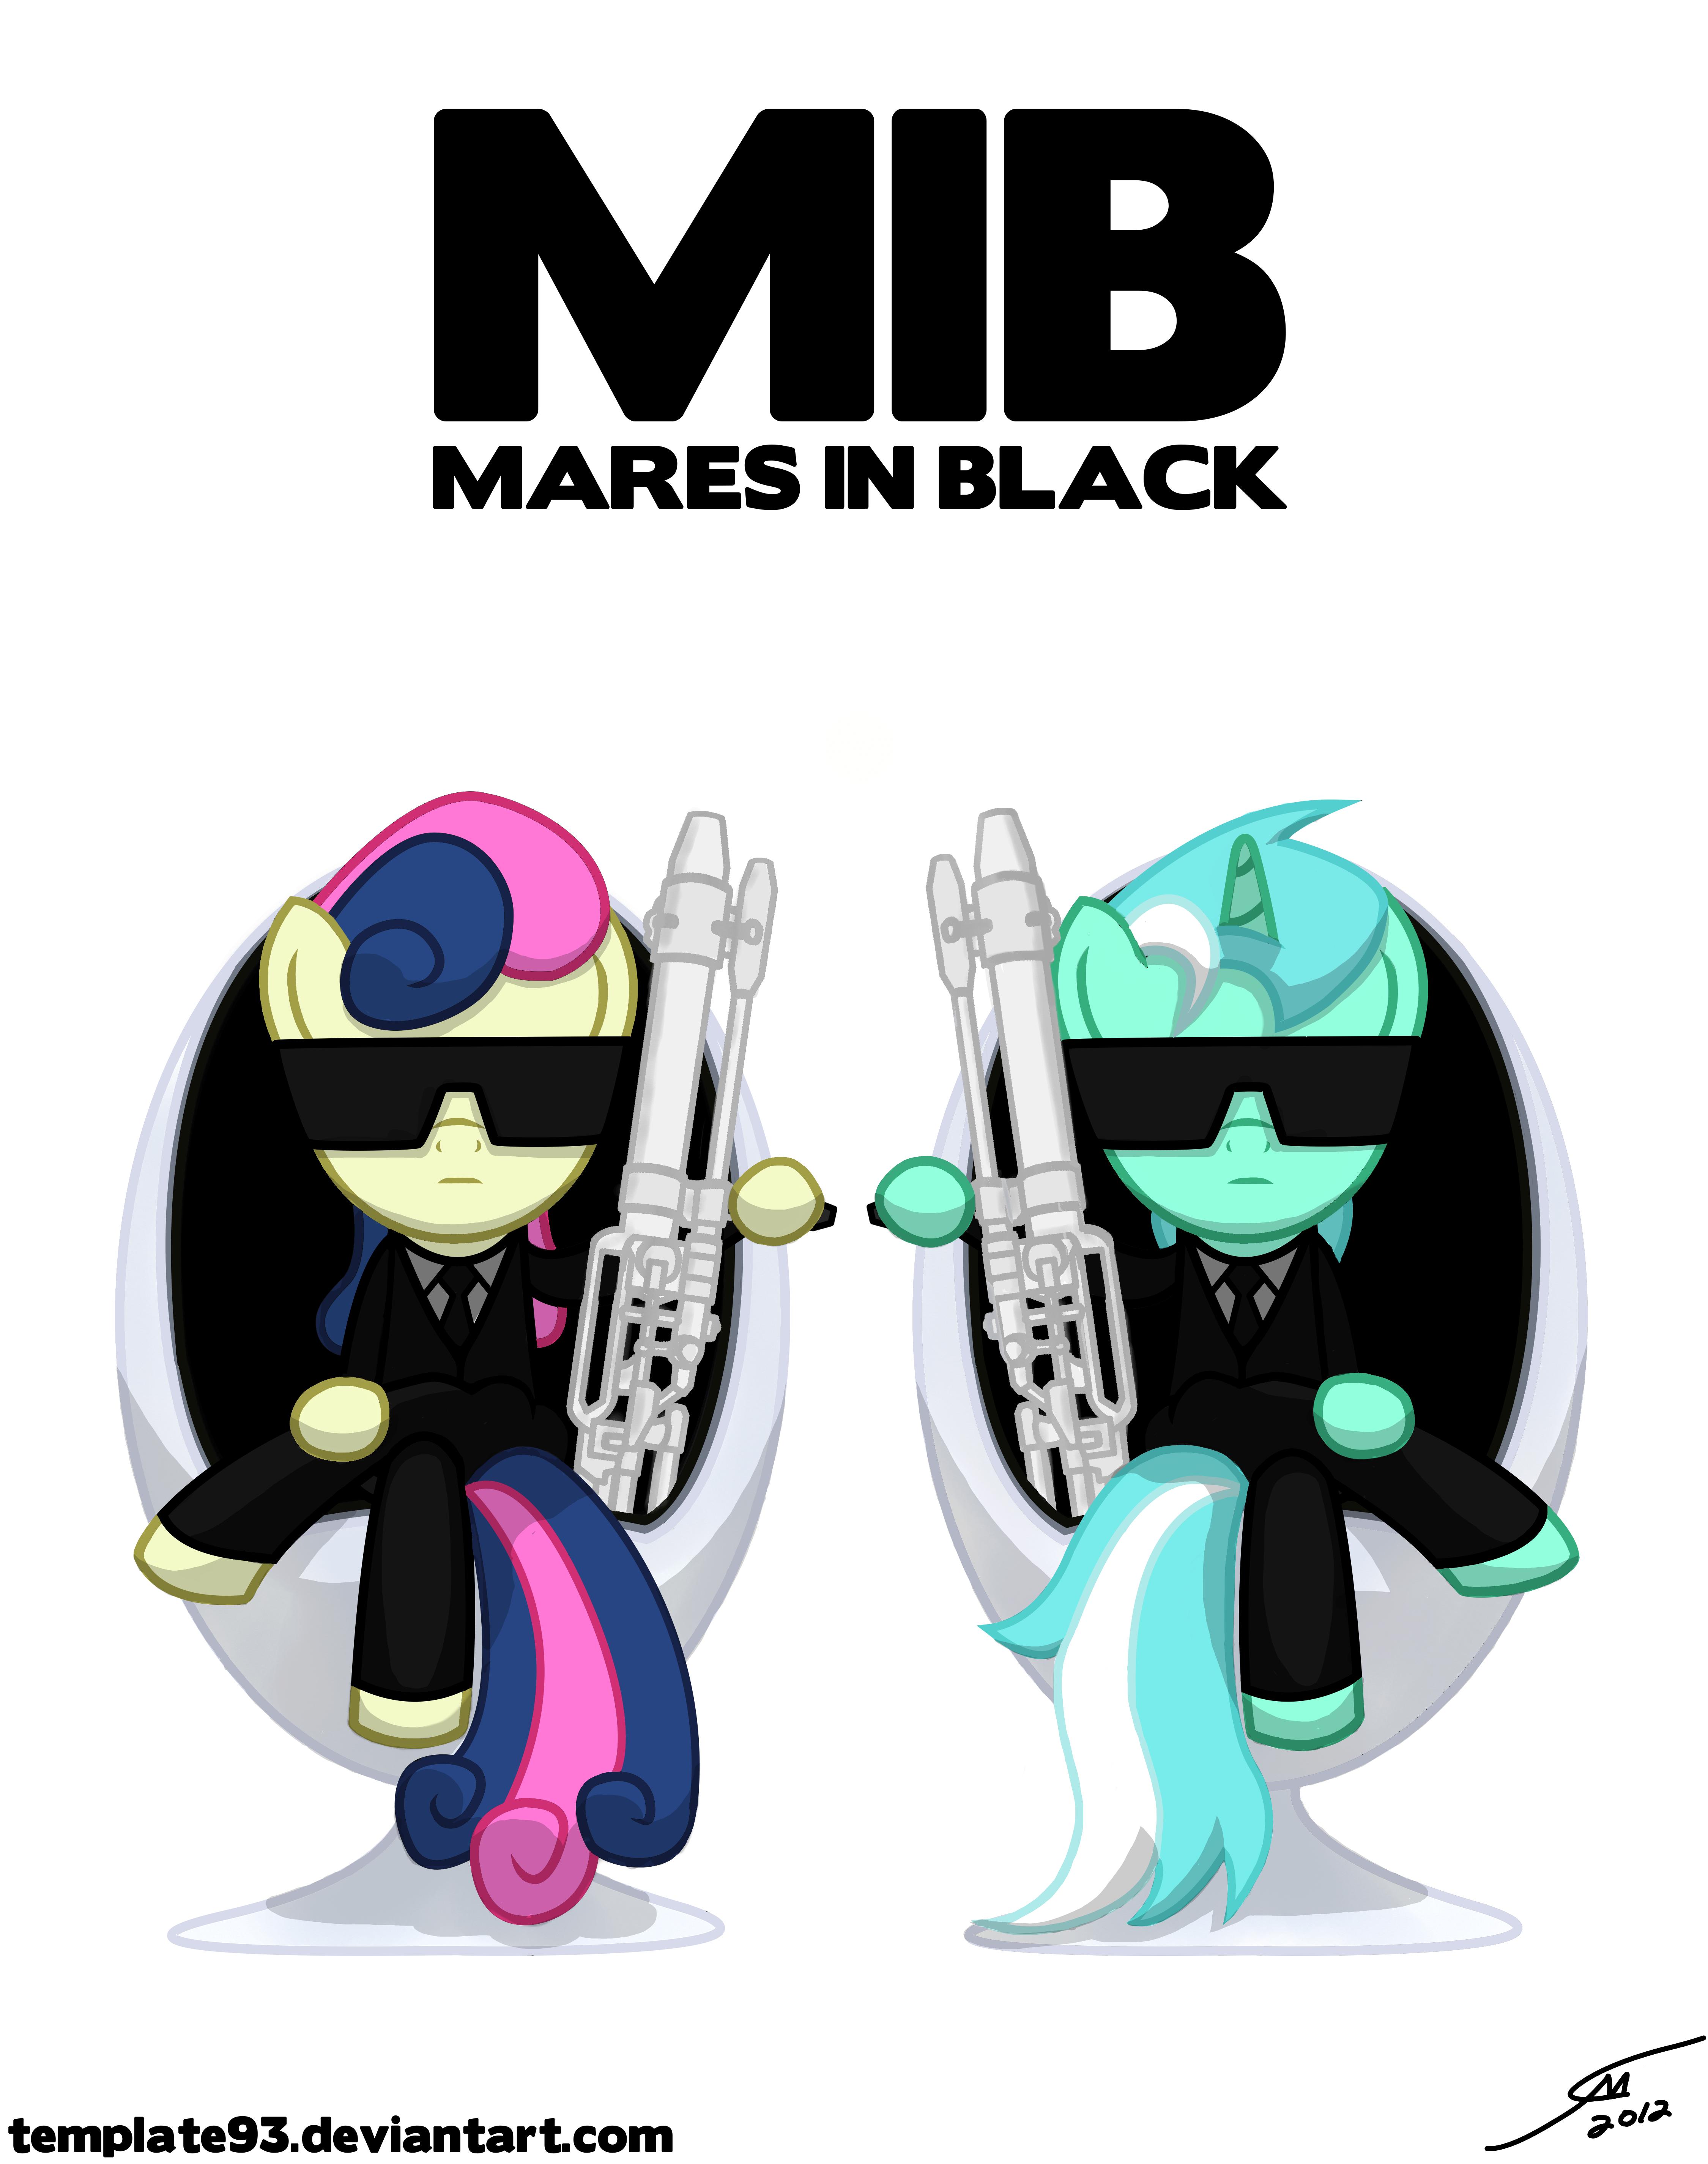 MARES IN BLACK Template93deviantart